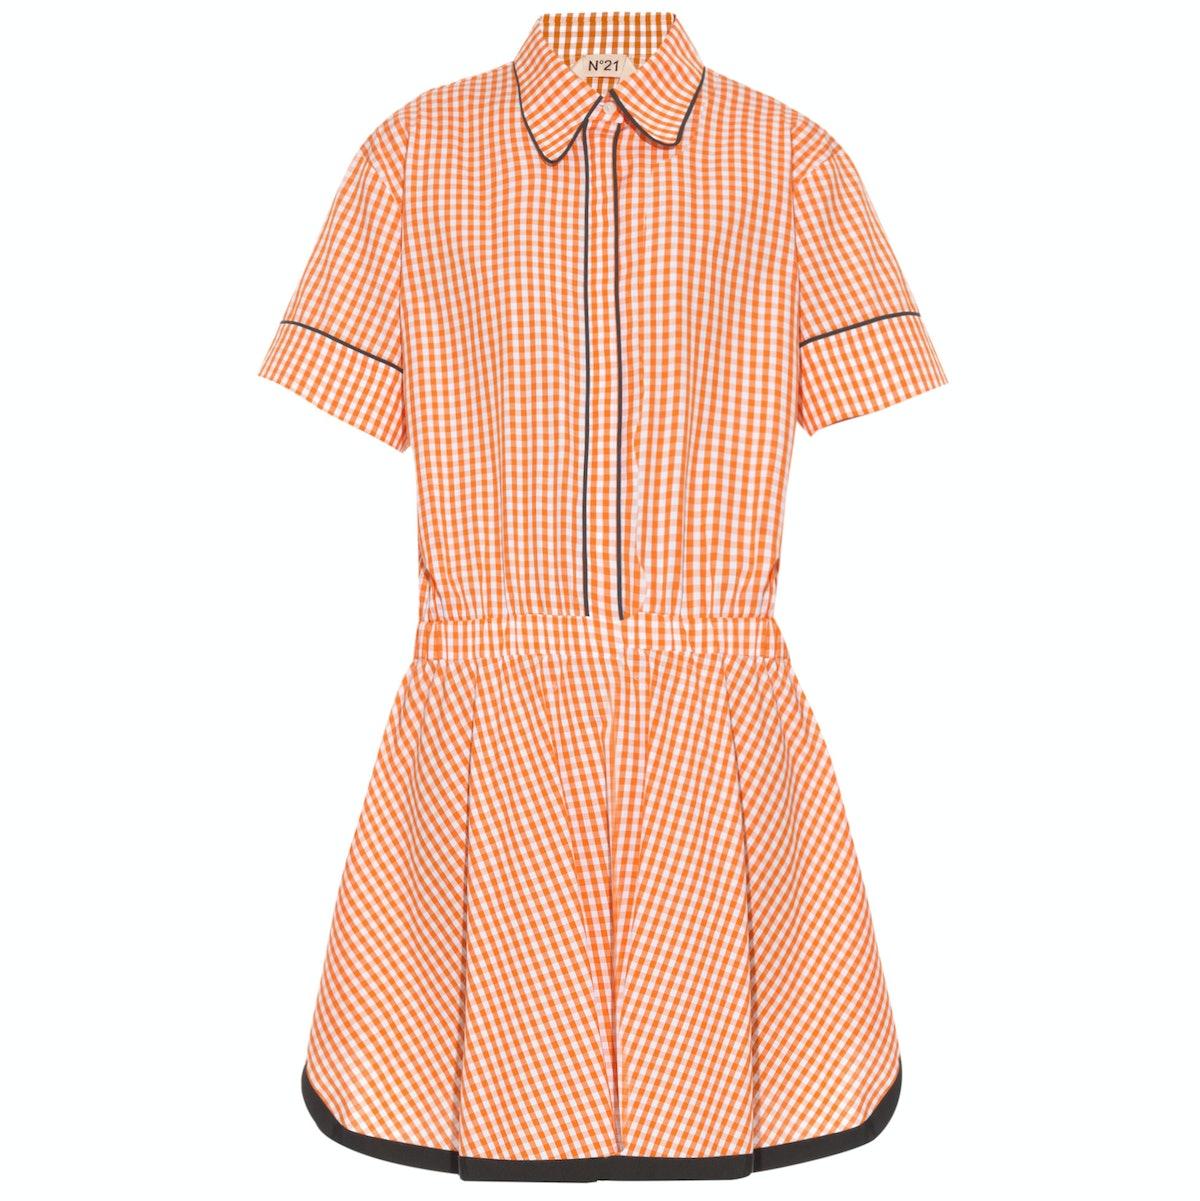 No. 21 dress